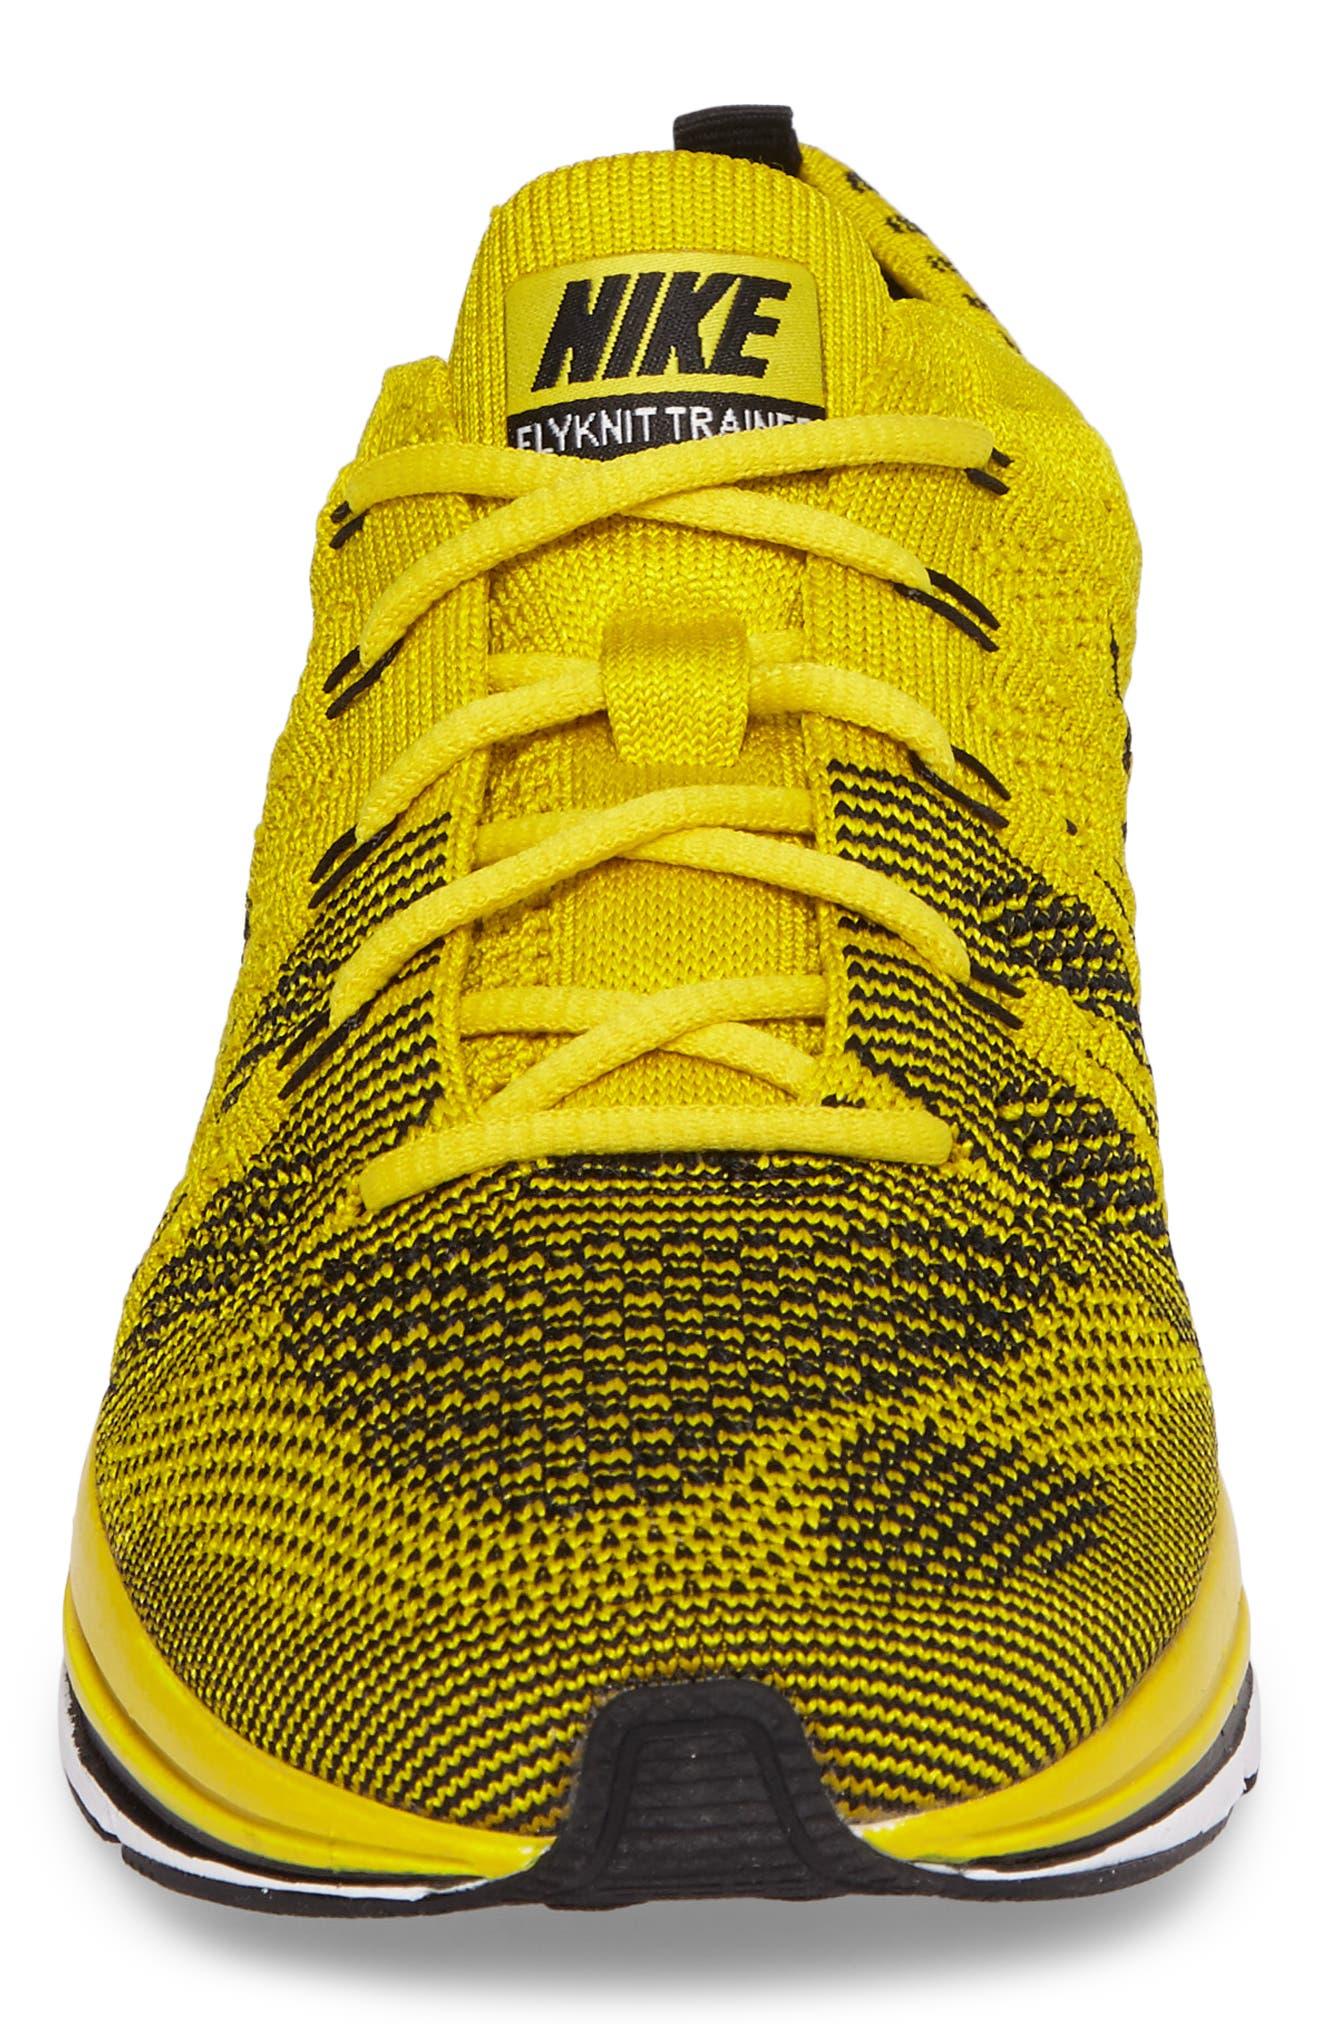 NikeLab Flyknit Trainer Sneaker,                             Alternate thumbnail 4, color,                             Bright Citron/ Black/ White